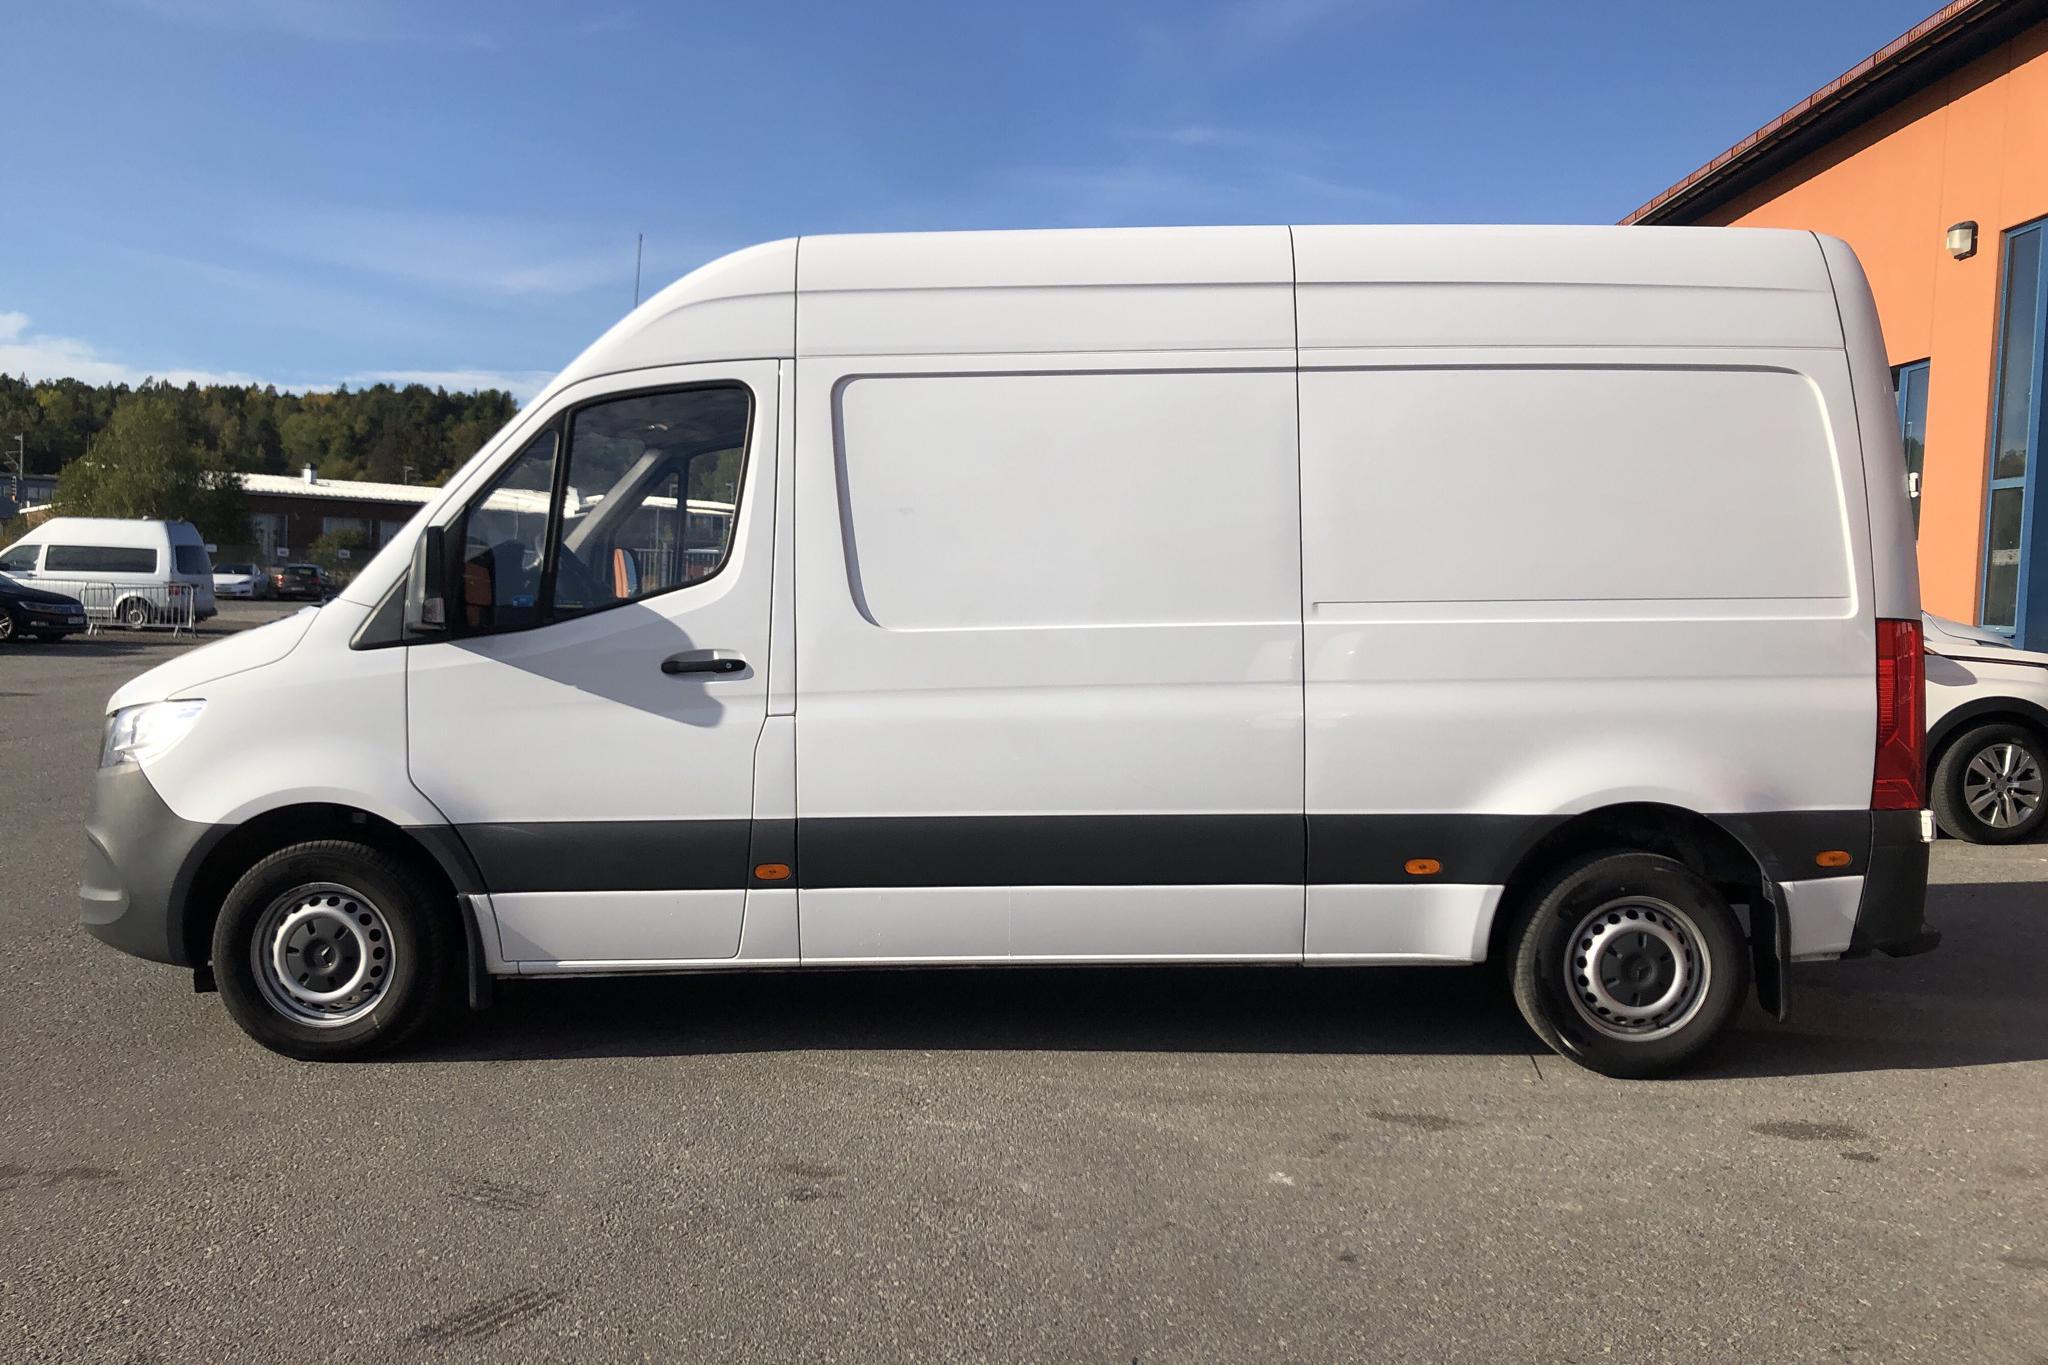 Mercedes Sprinter 314 CDI Skåp 2WD (143hk) - 53 530 km - Automatic - white - 2019